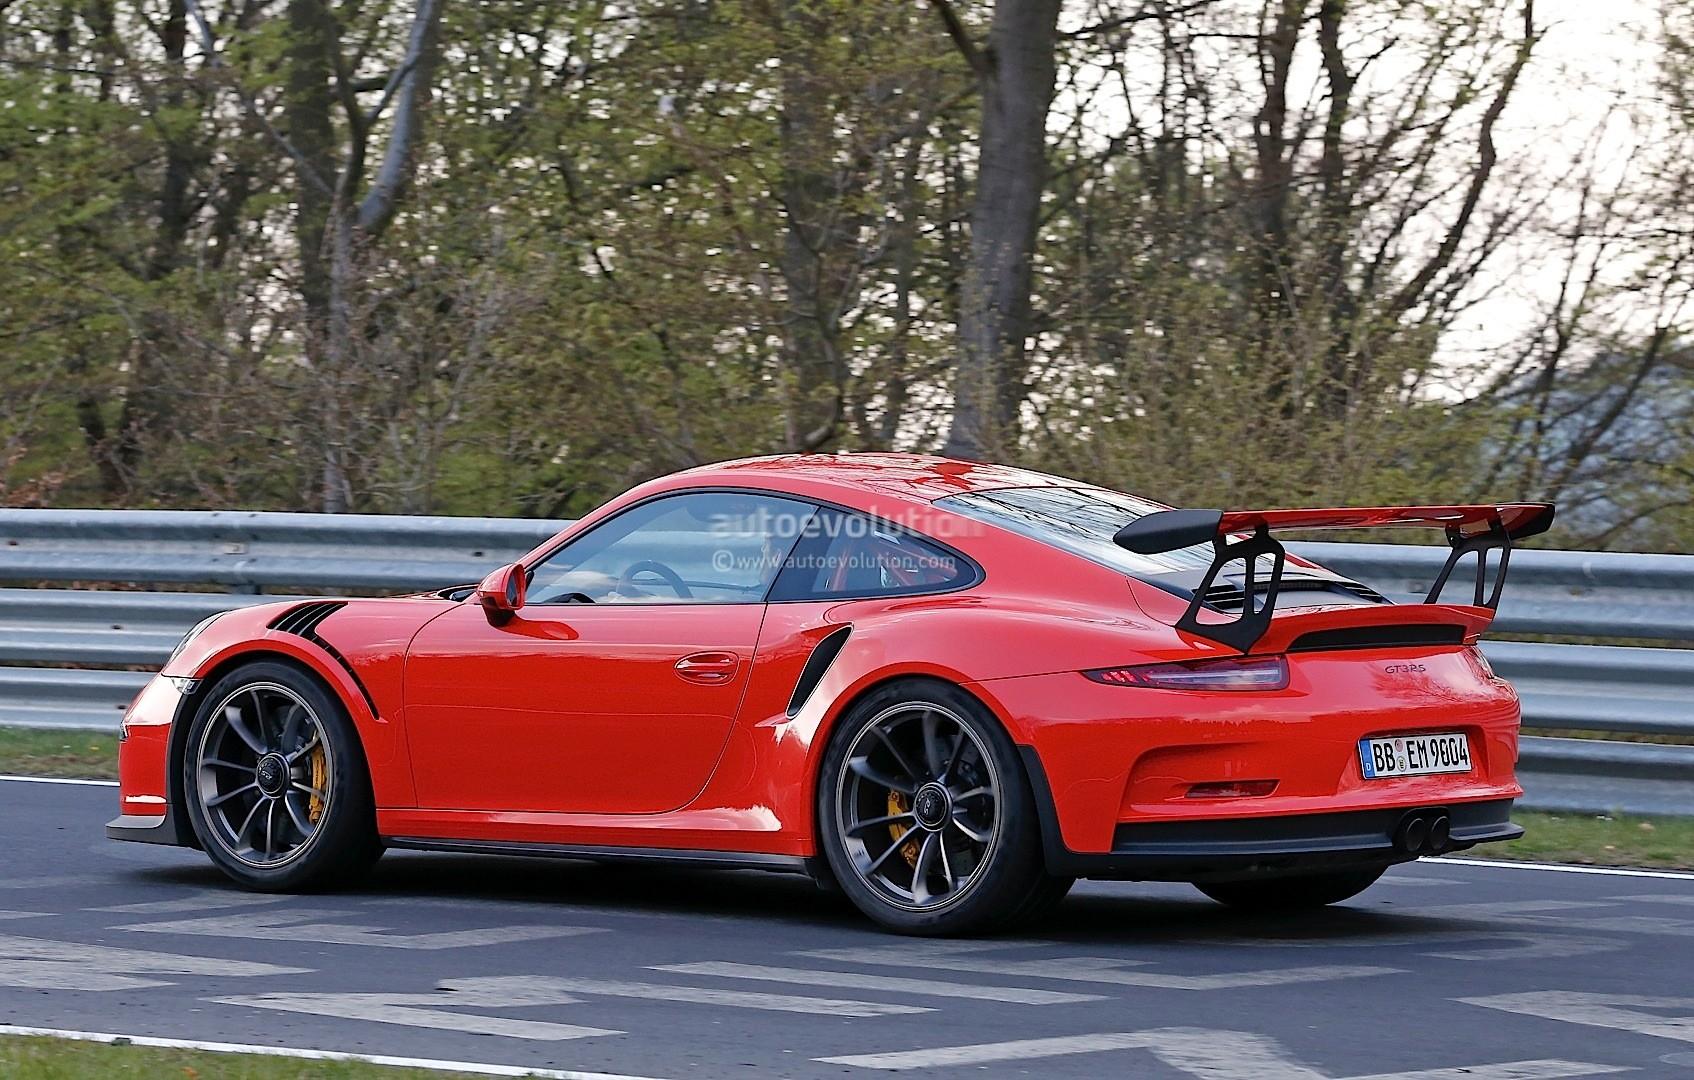 Mark Webber Drives The 2016 Porsche 911 Gt3 Rs On The